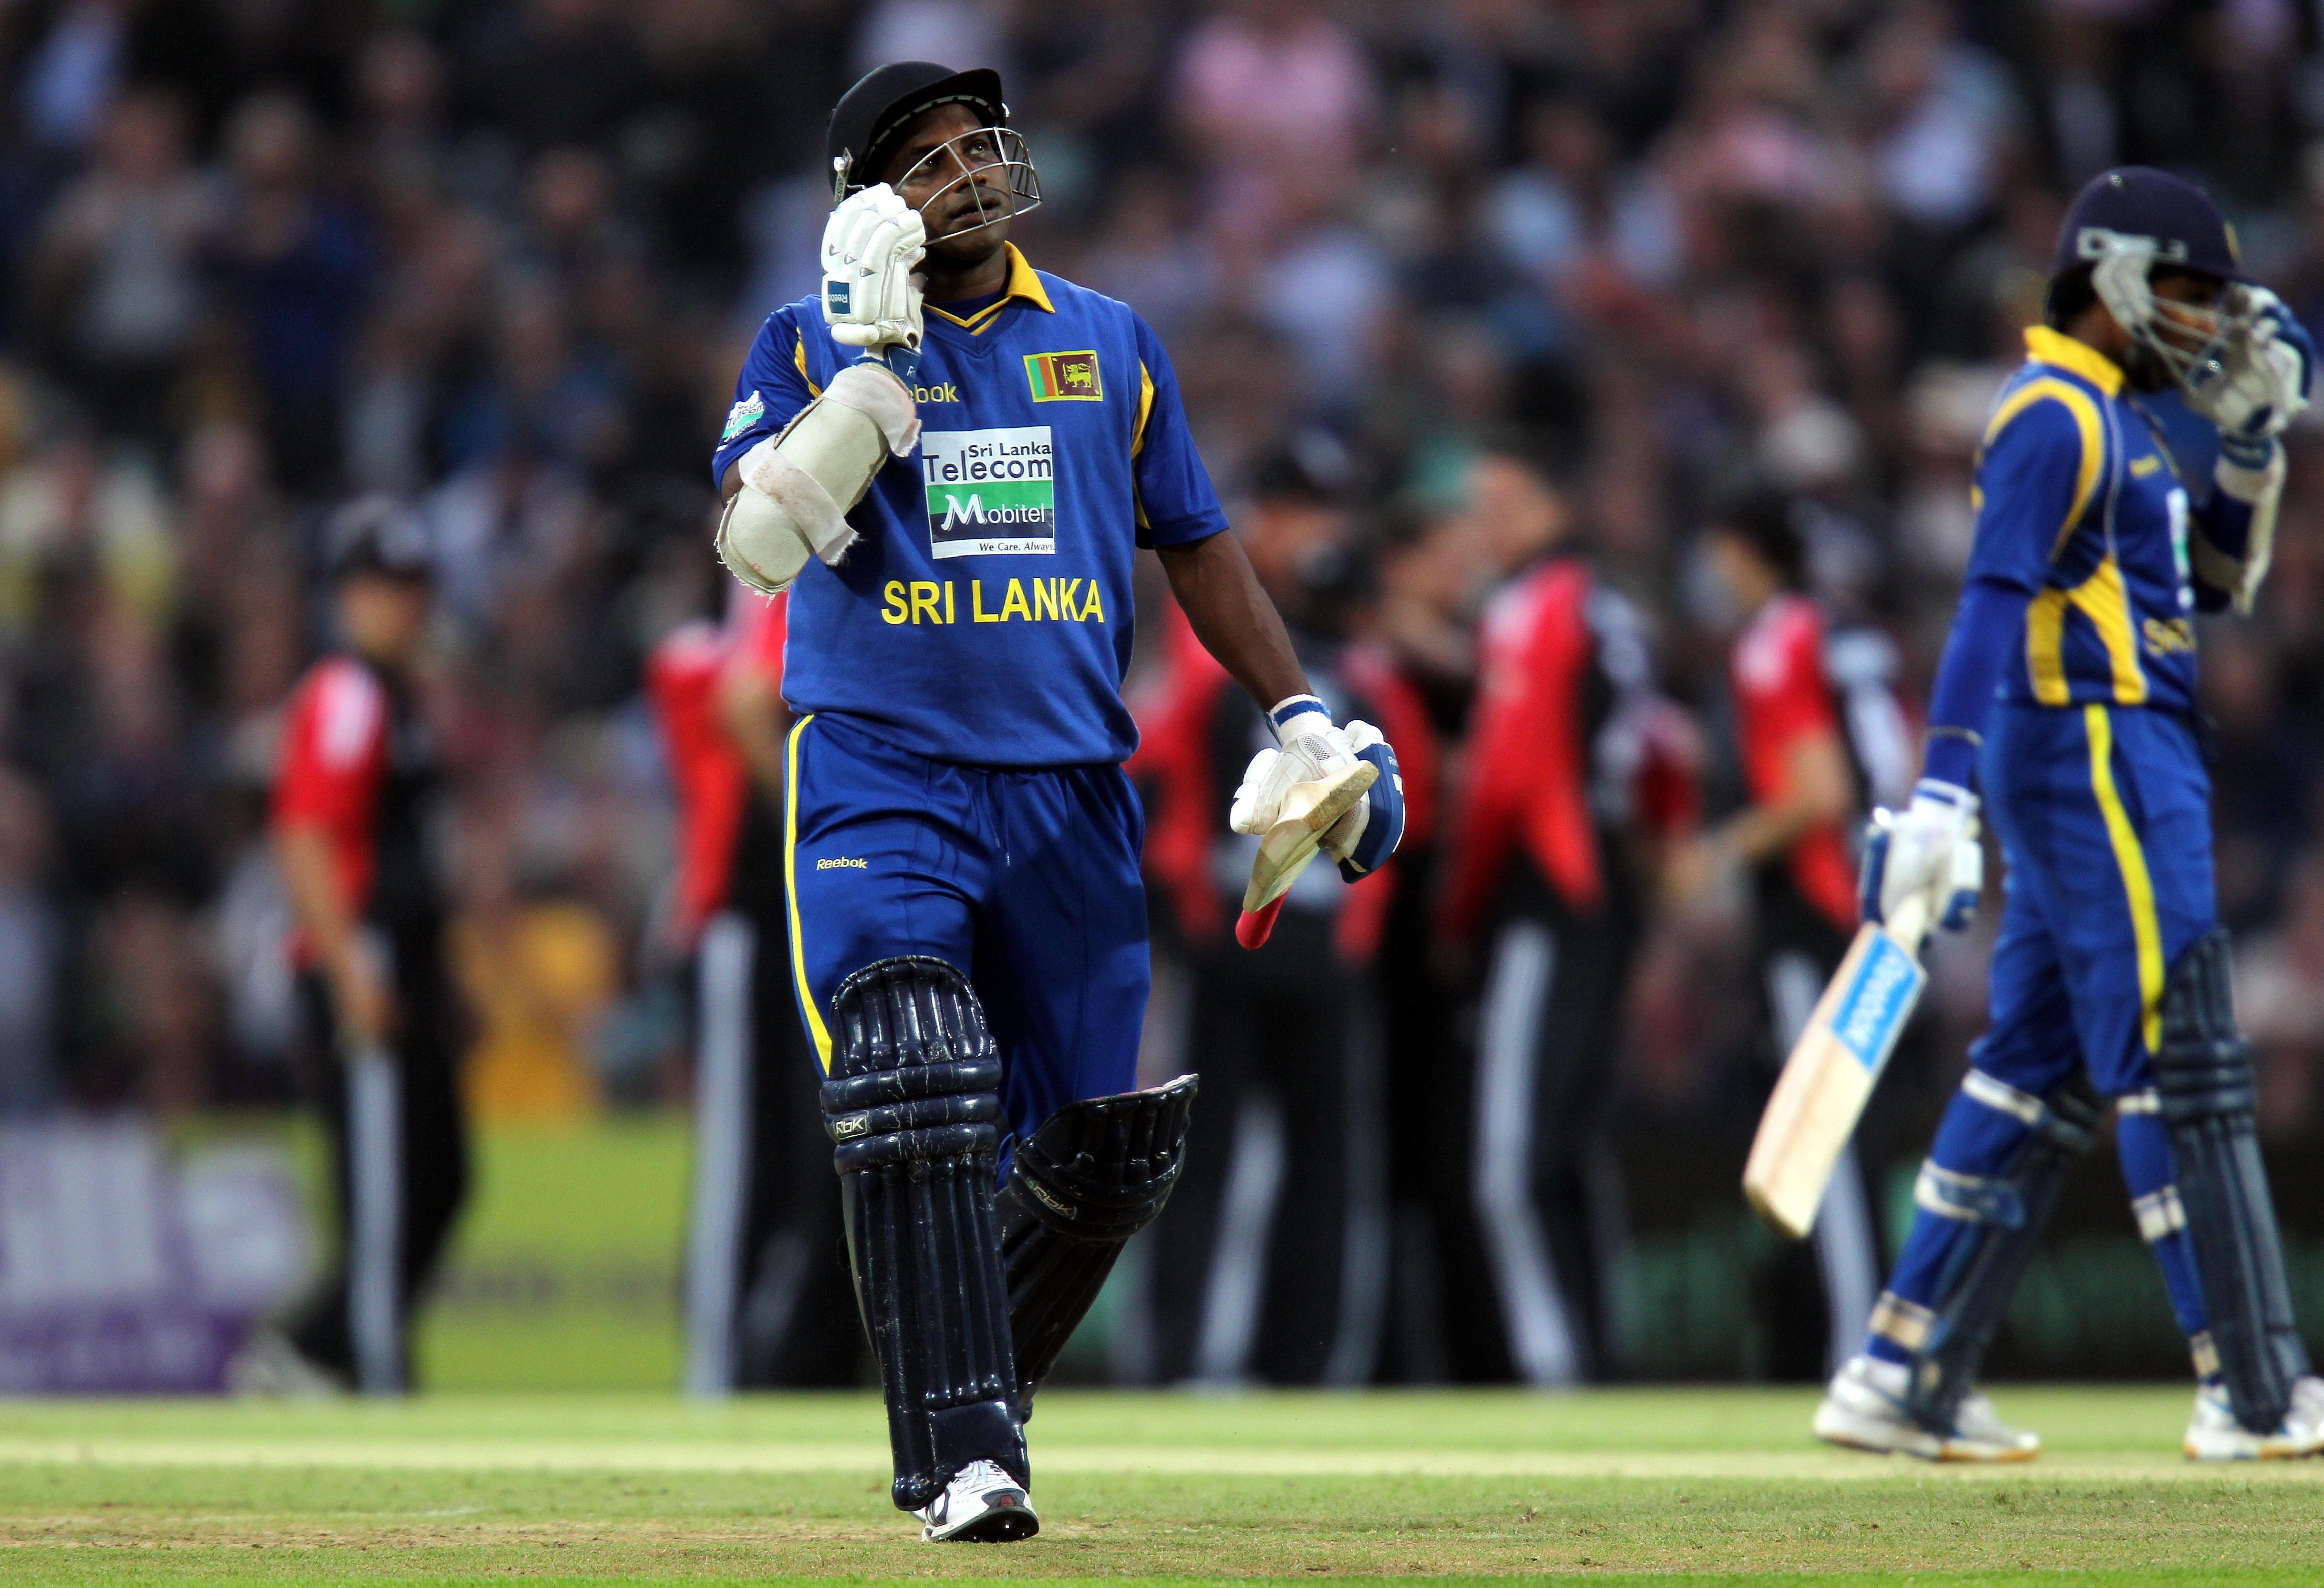 Men's Cricket Former Sri Lanka captain Sanath Jayasuriya